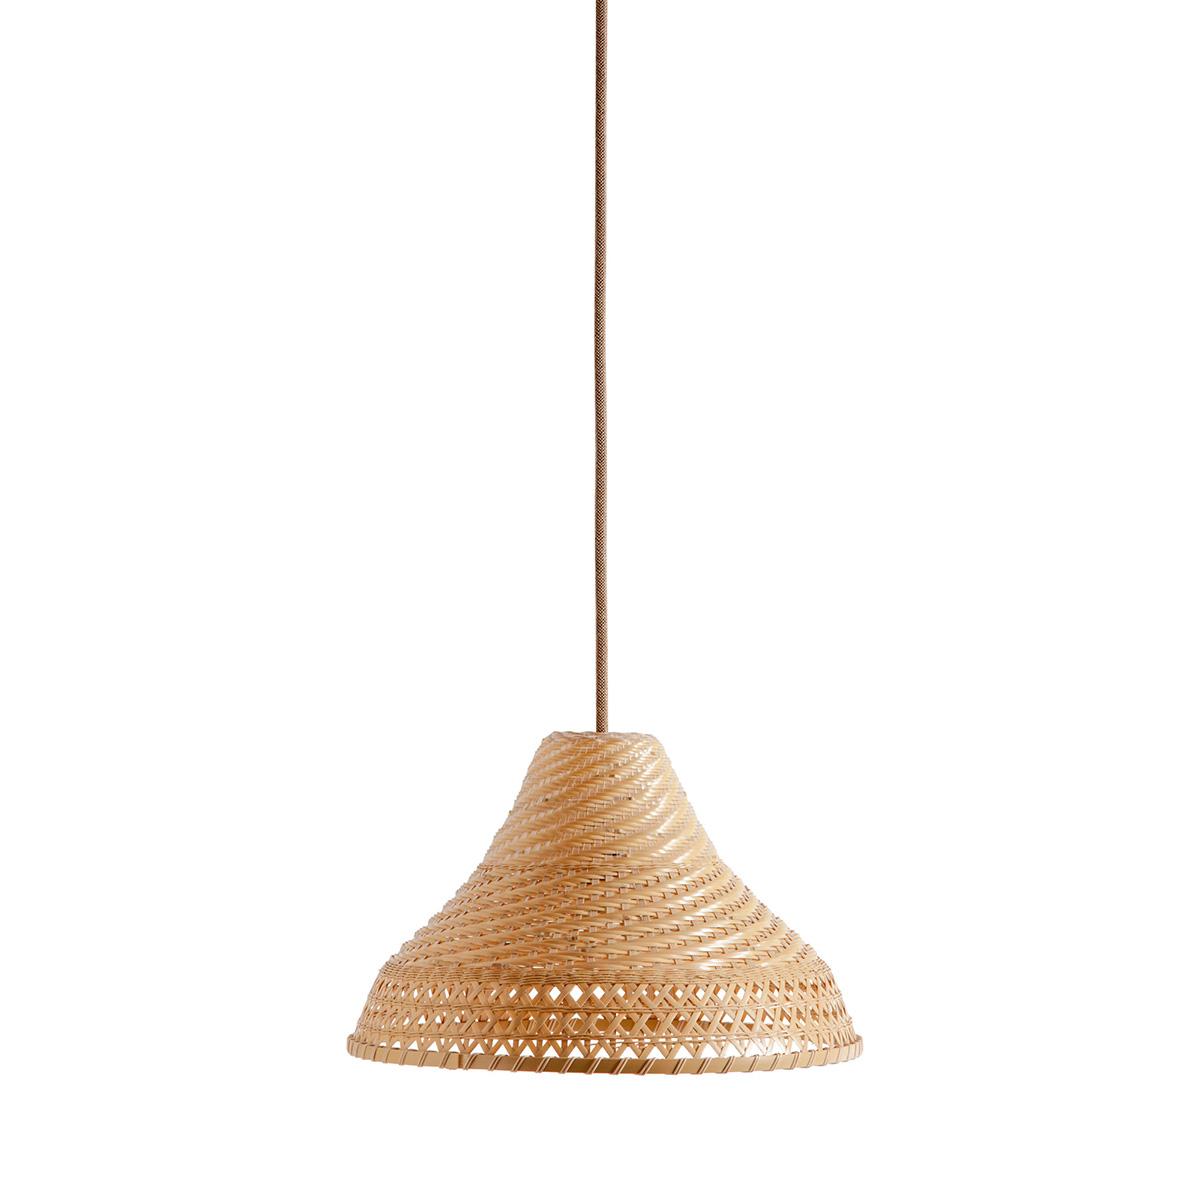 07-pet-lamp-kyoto-chiemi-ogura-alvaro-catalan-ocon